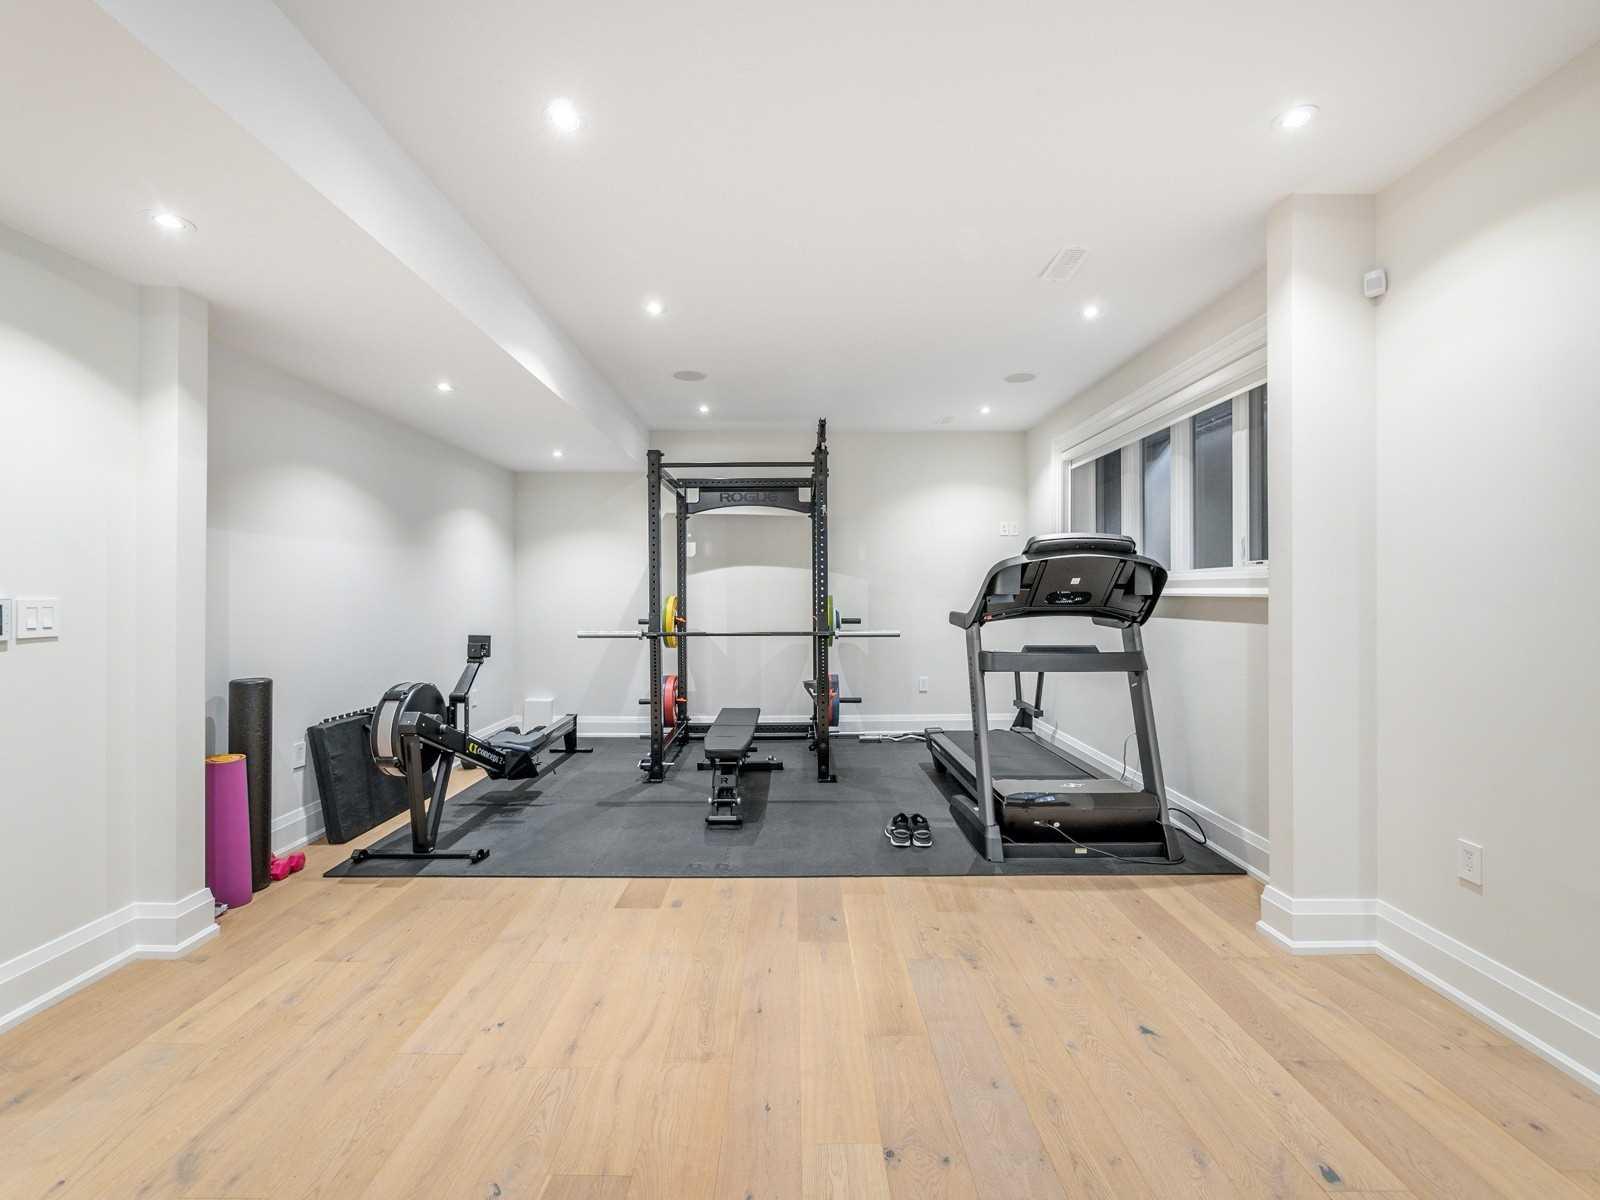 248 Lytton Blvd, Toronto, Ontario M5N1R6, 5 Bedrooms Bedrooms, 10 Rooms Rooms,5 BathroomsBathrooms,Detached,For Sale,Lytton,C5361295